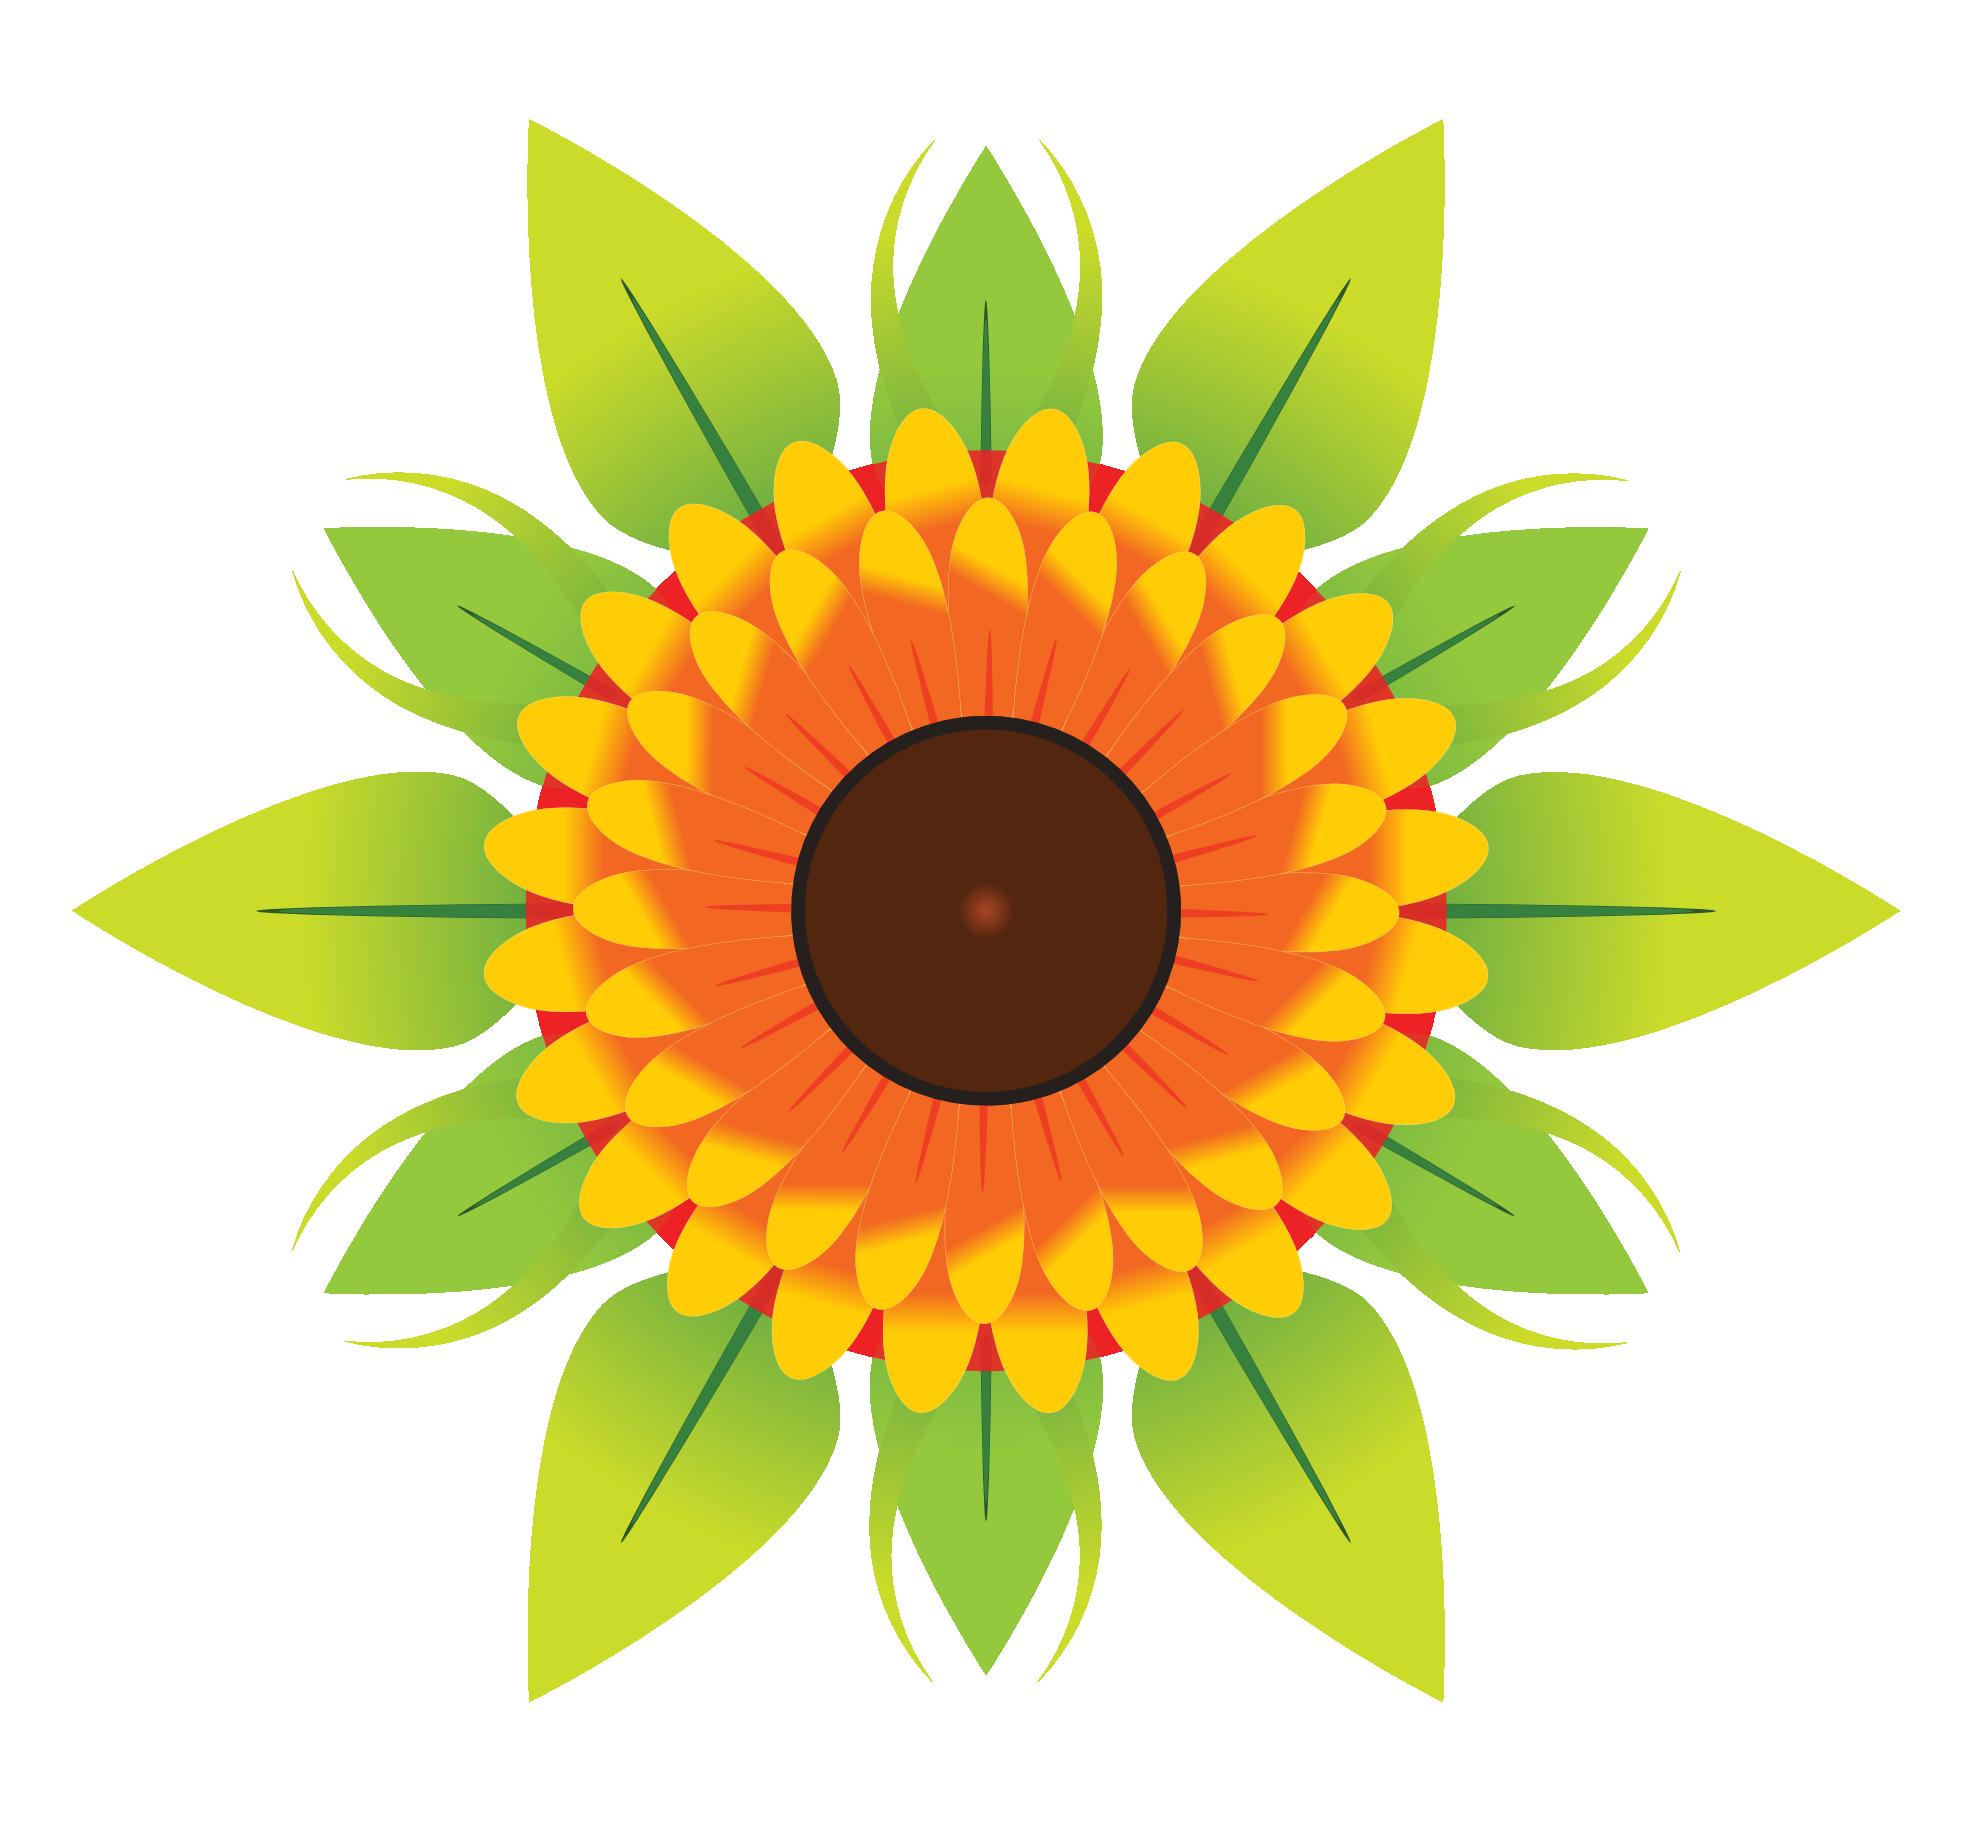 Flower Vector PNG Image - Floral PNG